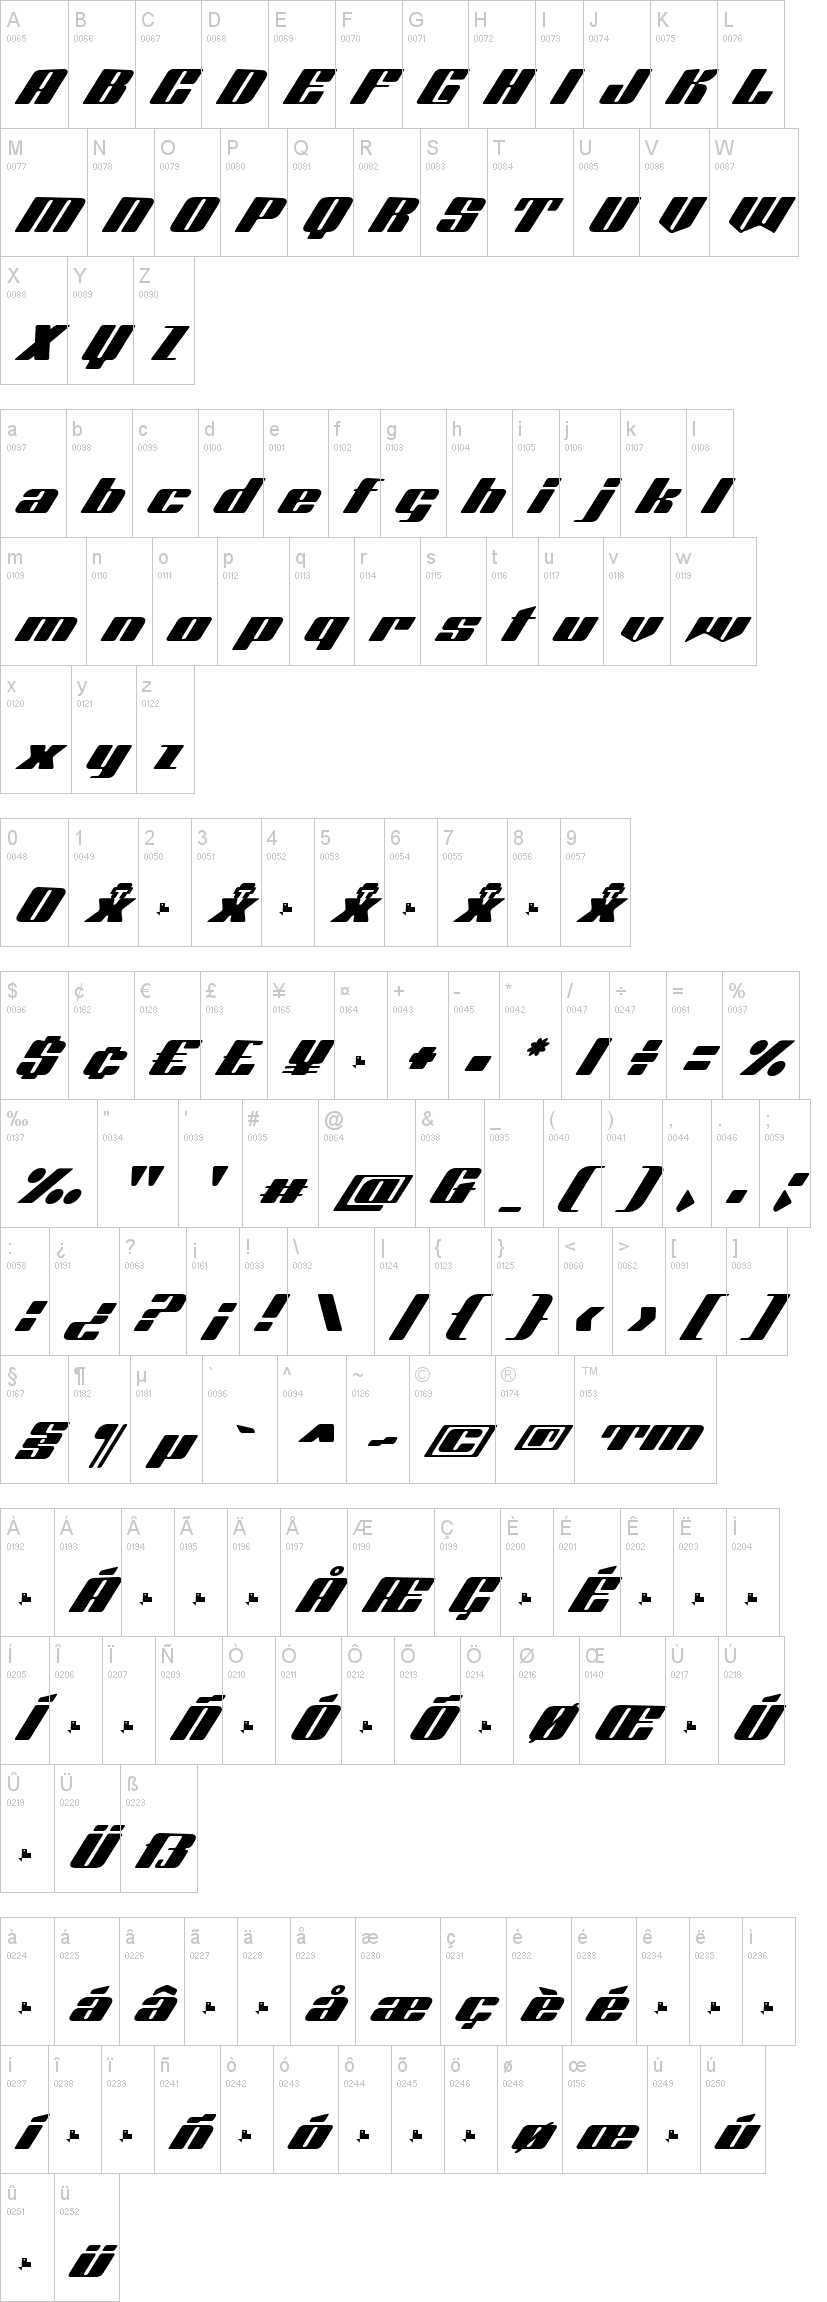 Octuple Max Font-1